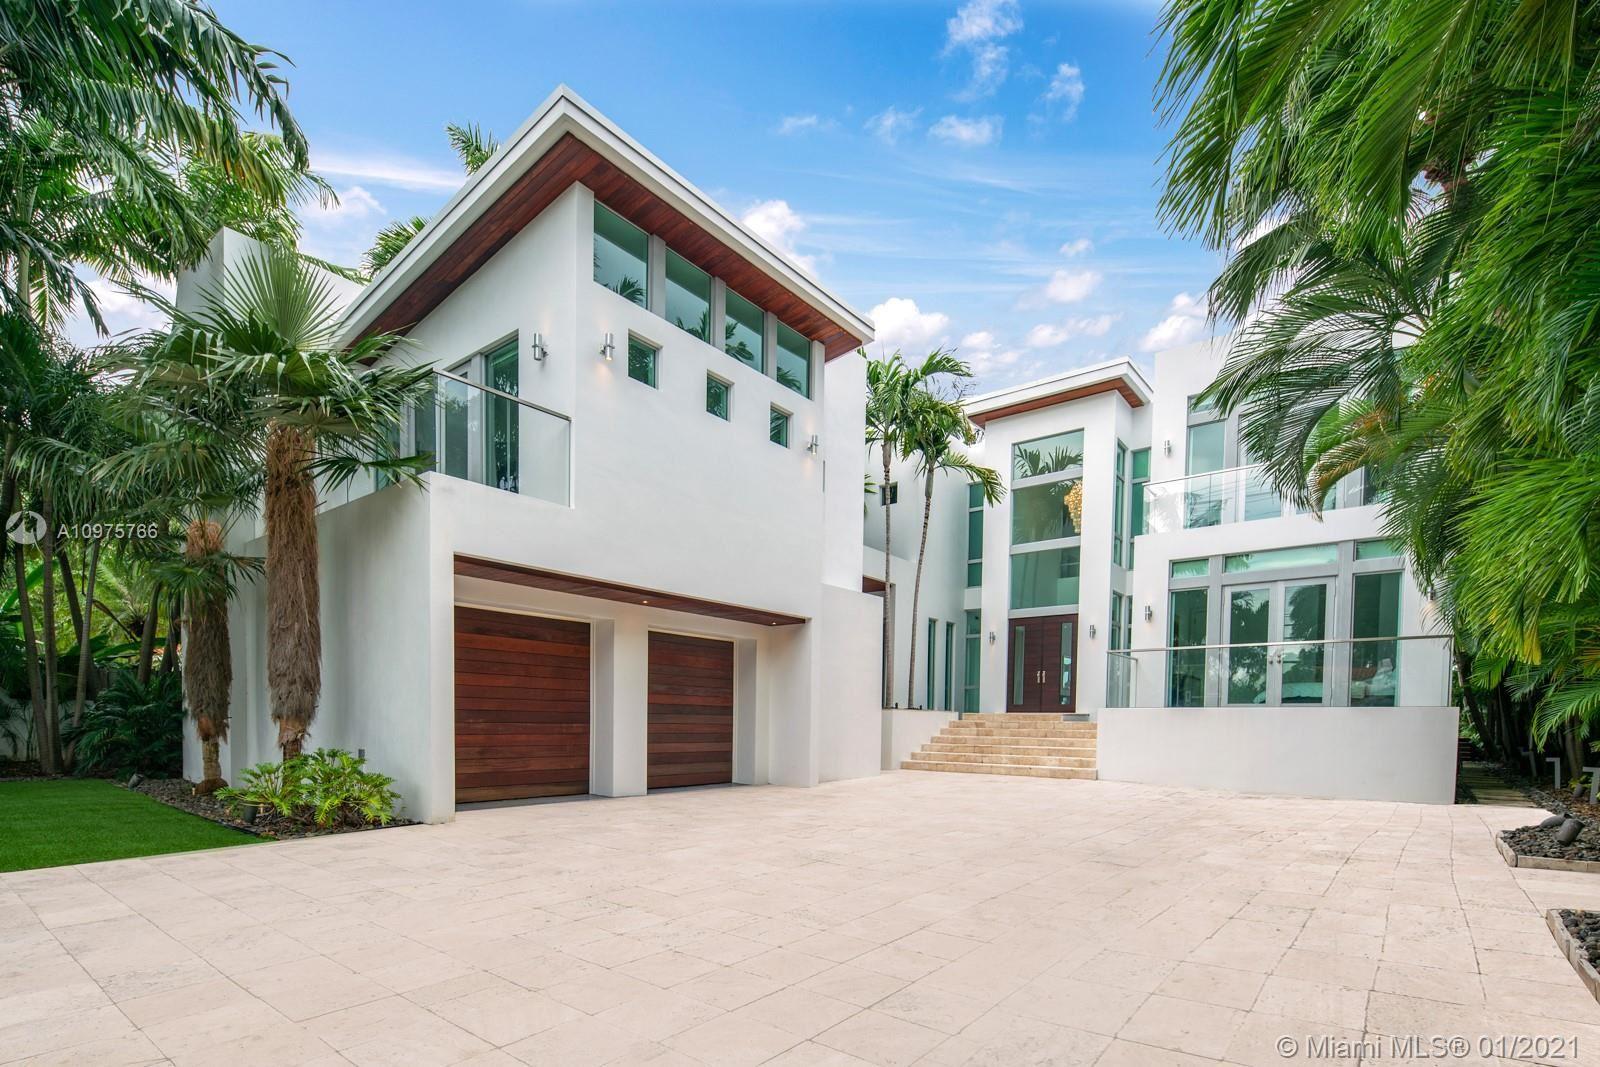 1337 N Venetian Way, Miami, FL 33139 - #: A10975766